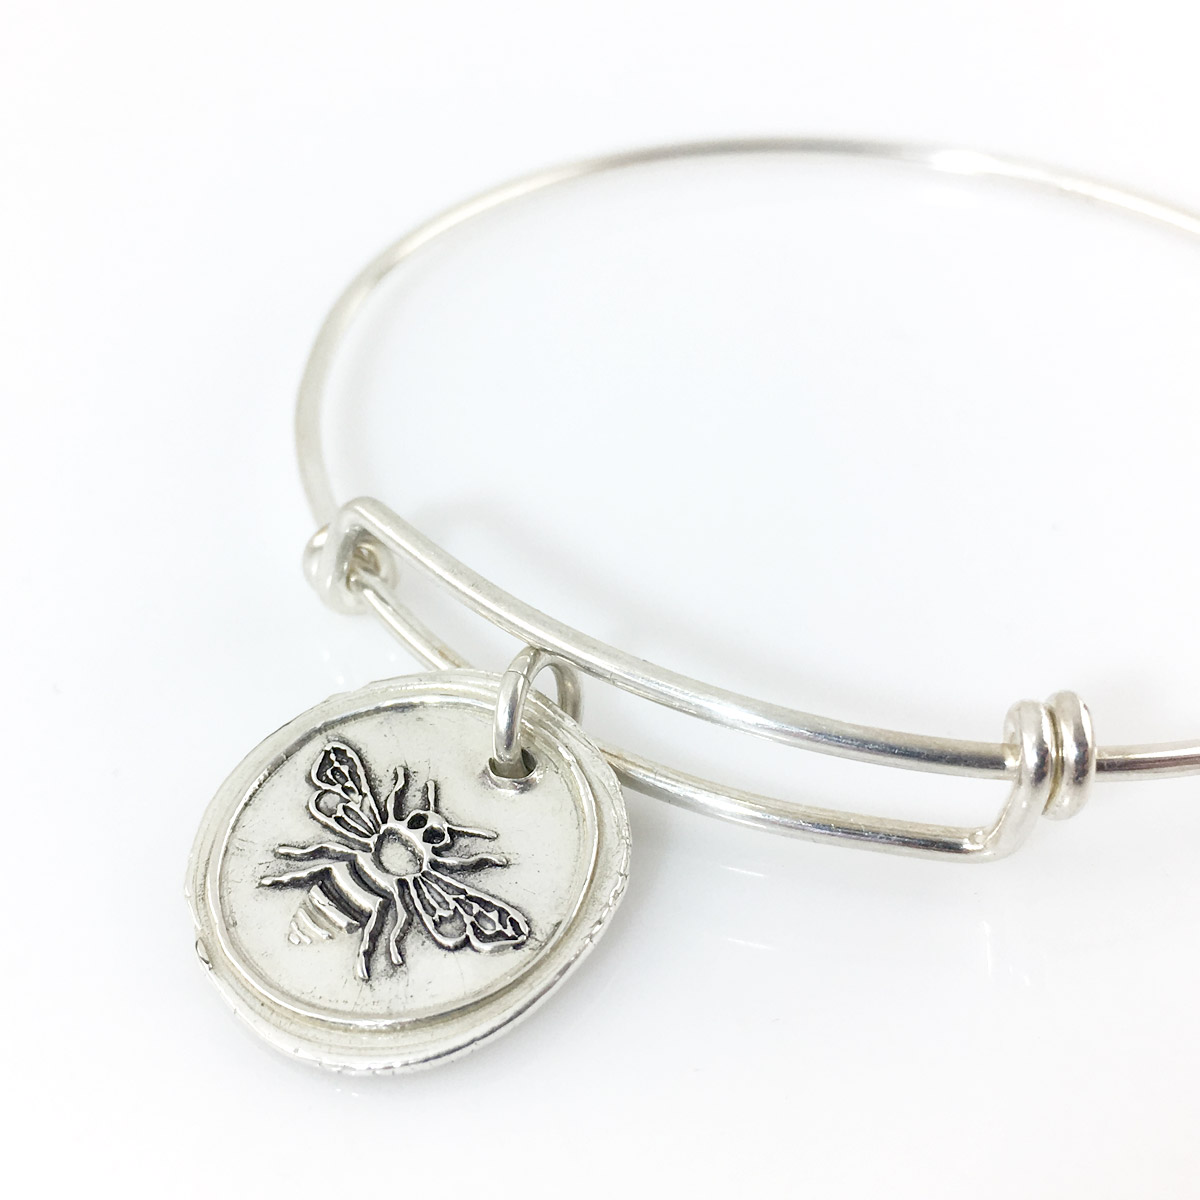 Honey Bee | Wax Seal Inspired Bangle Bracelet